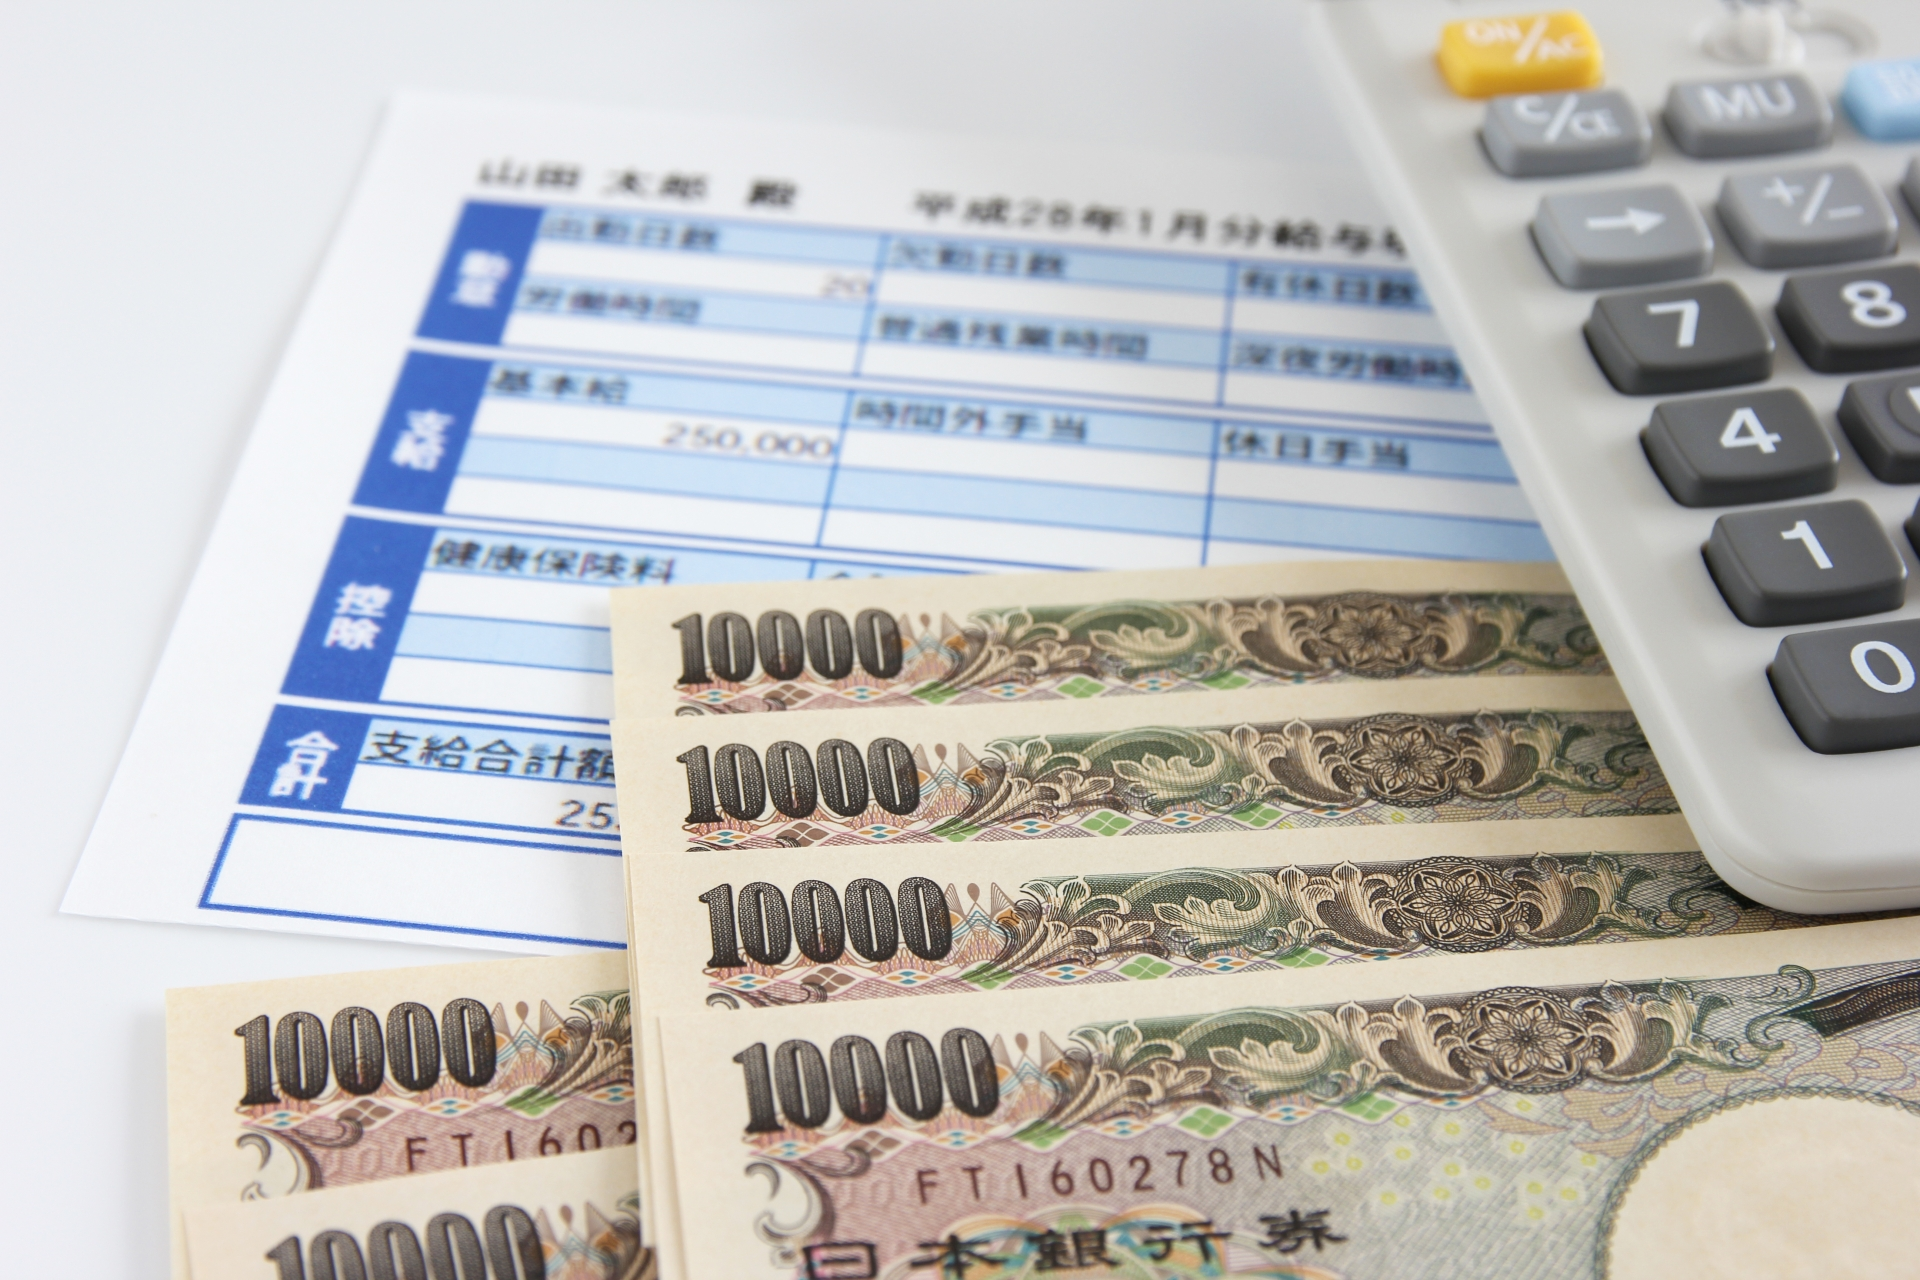 就労継続支援A型事業所の給料と利用料